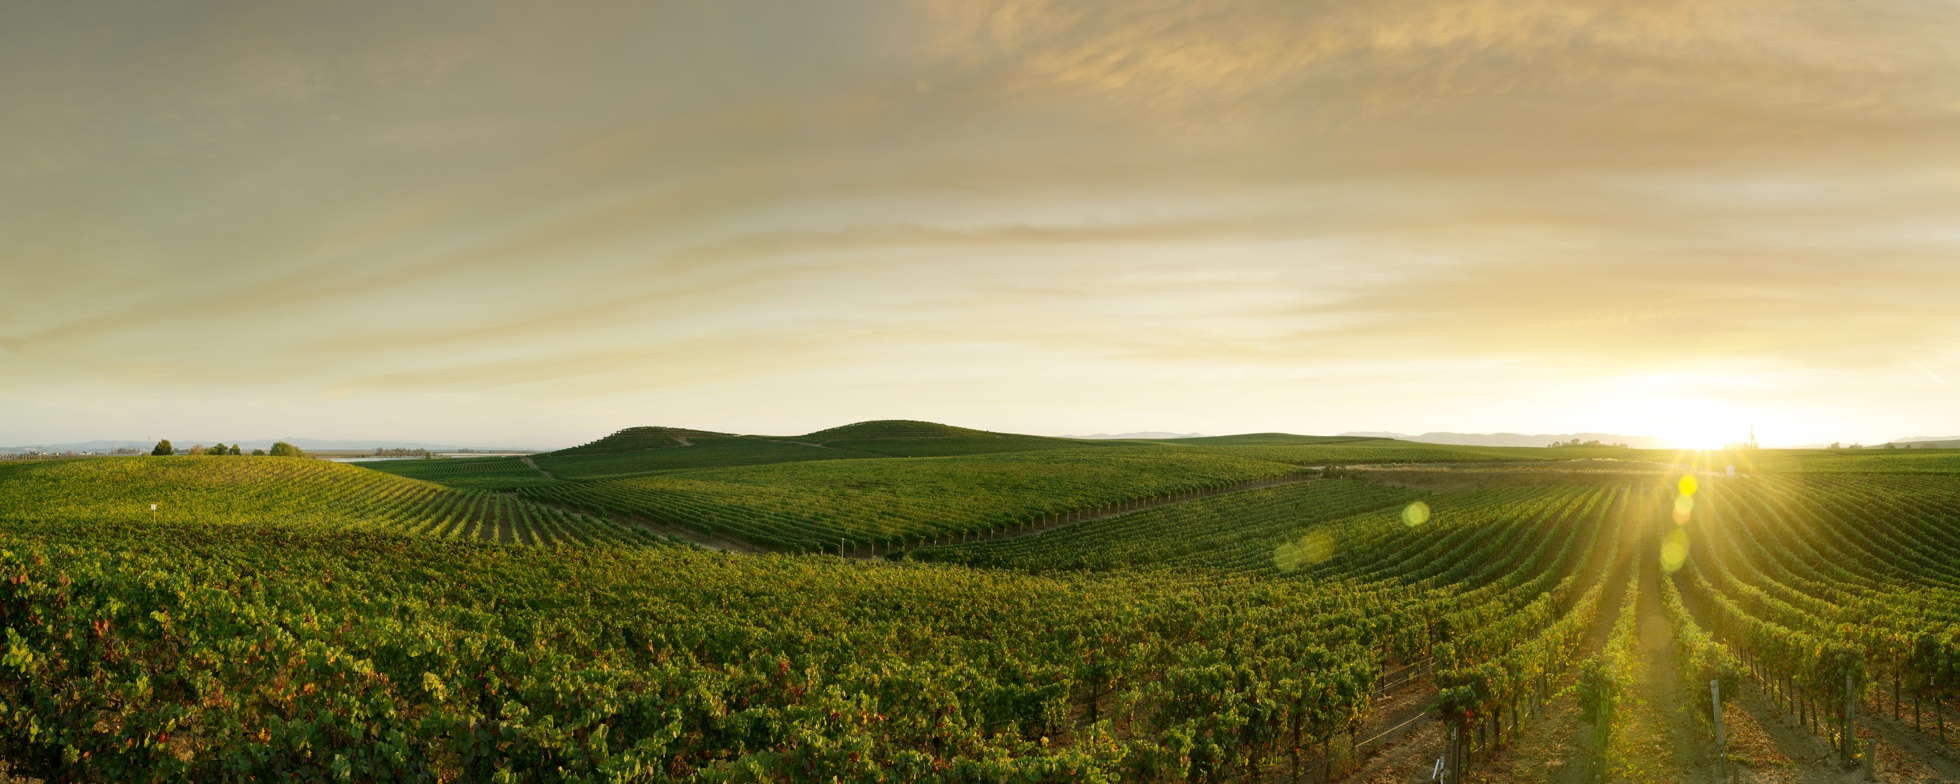 wine and beverage logistics in oakland california